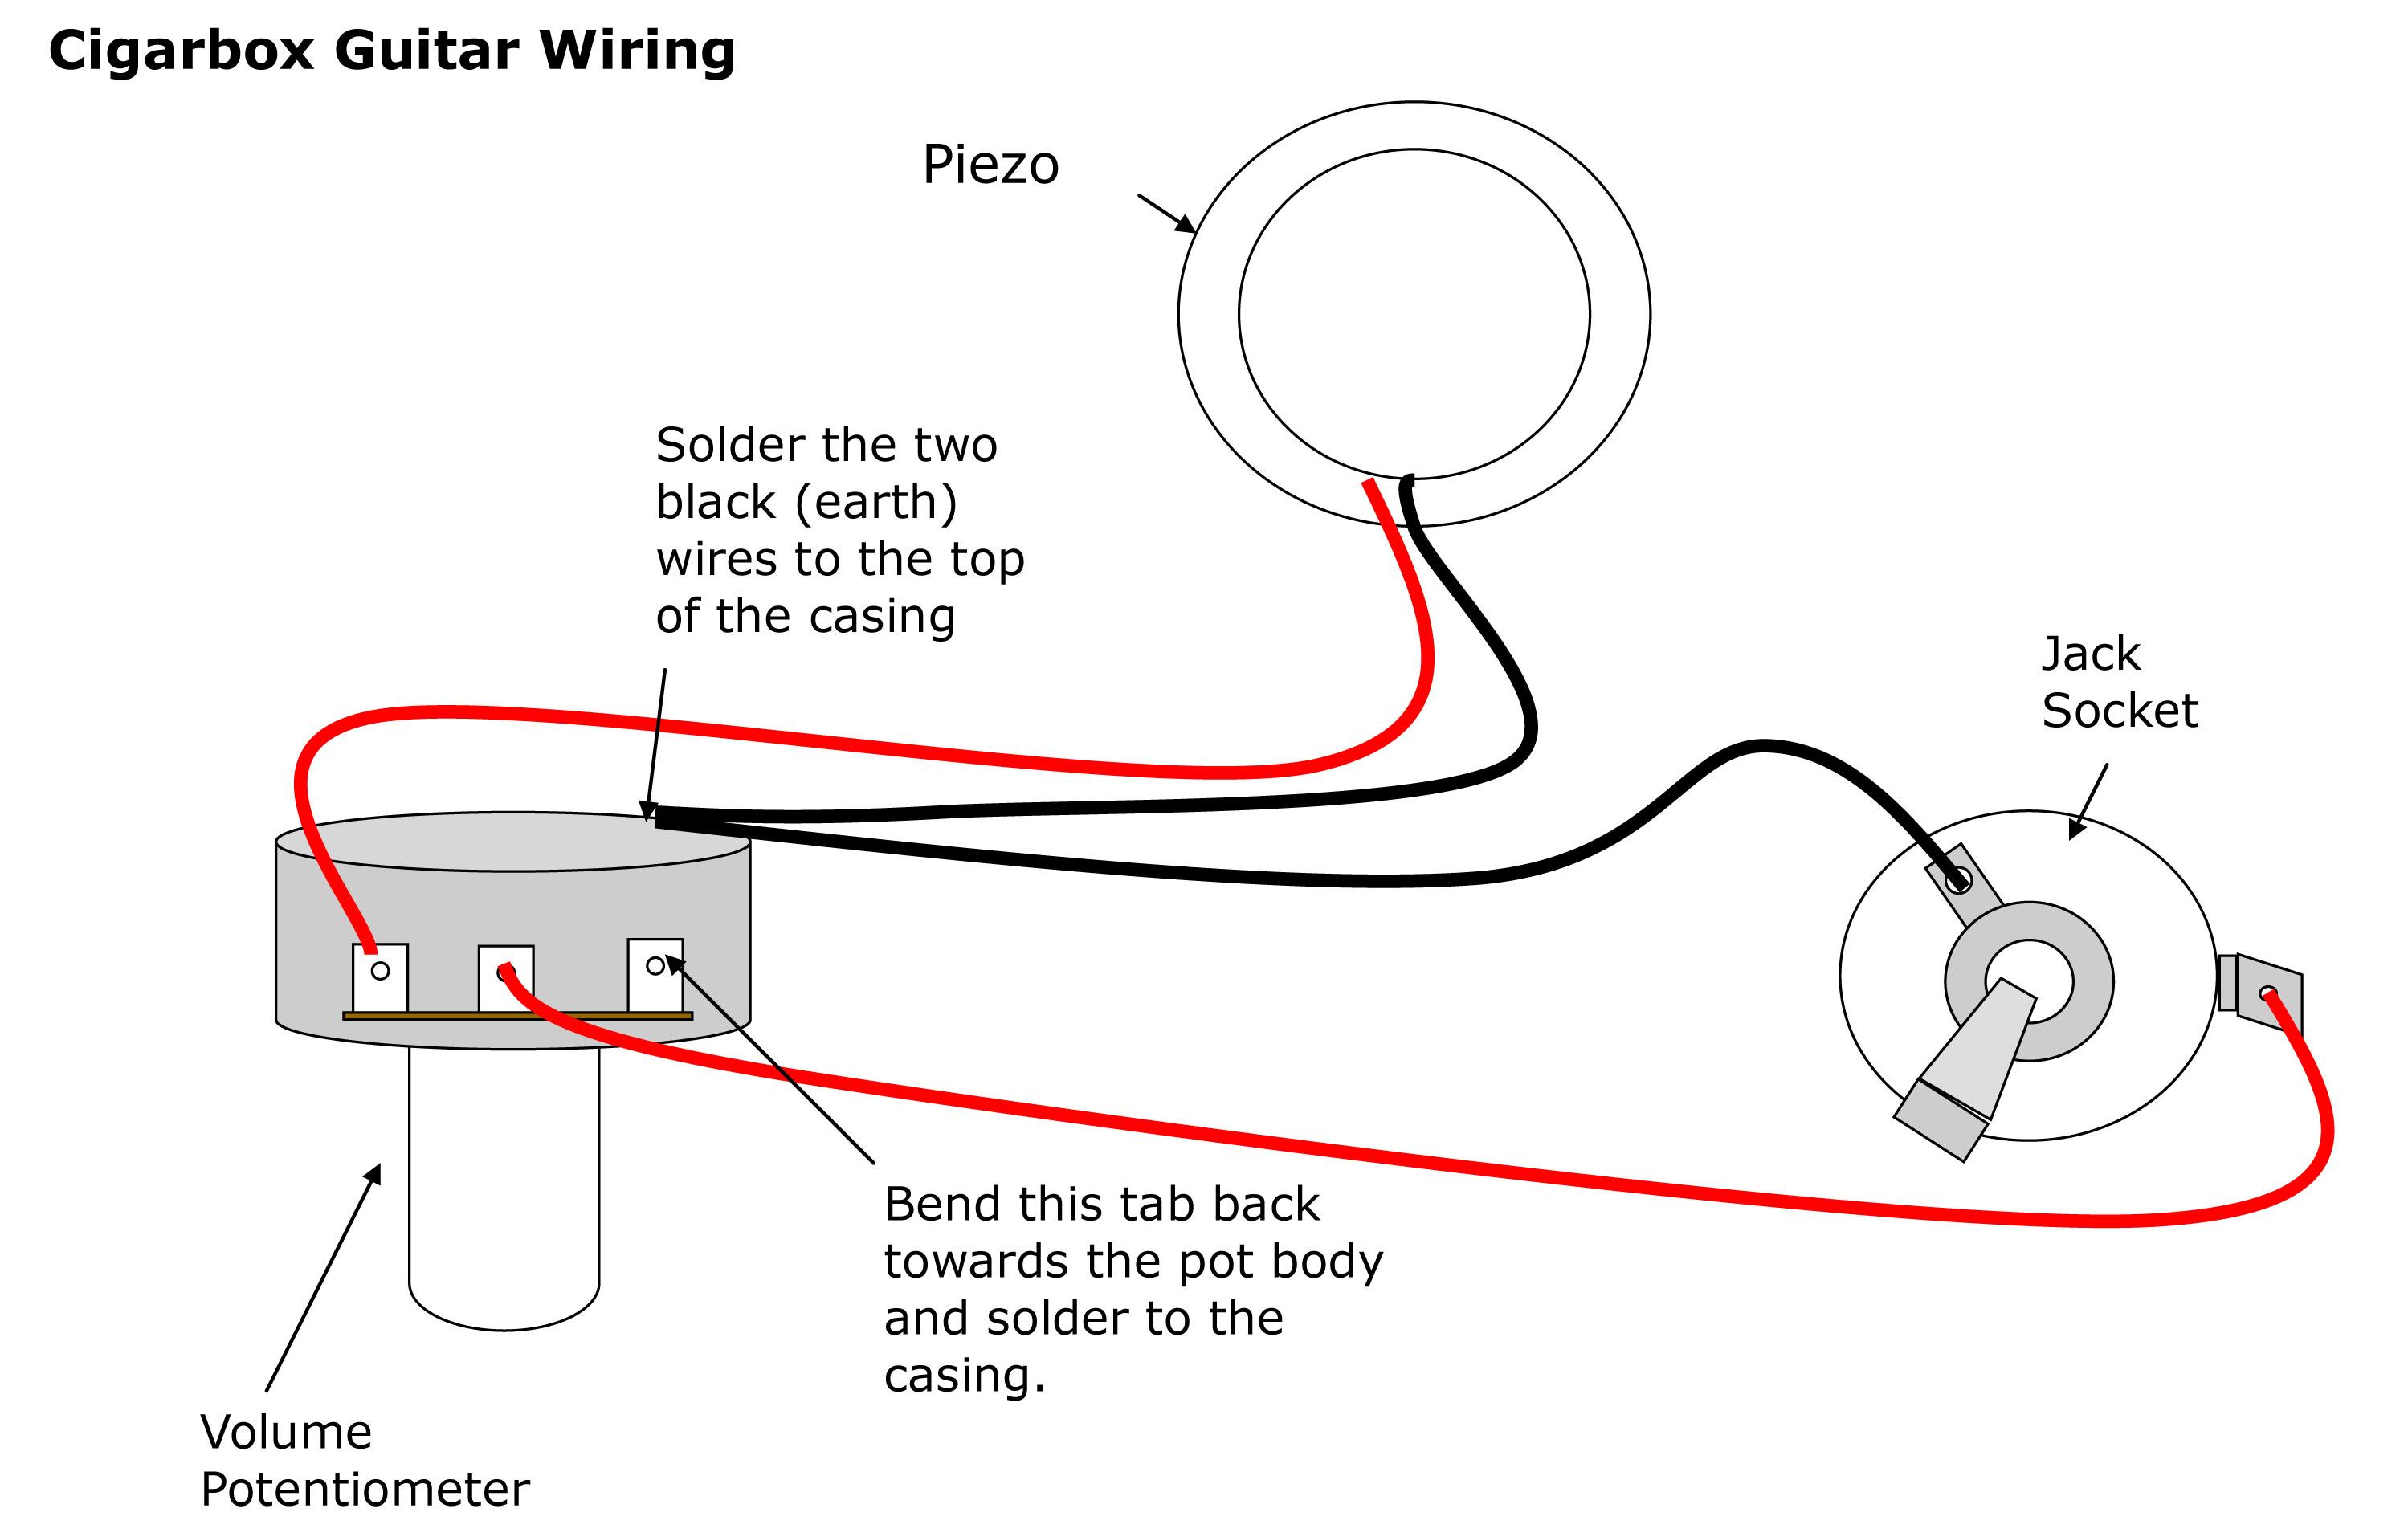 Fabulous Free Download Guitar Wiring Diagram Wiring Diagram Wiring Cloud Loplapiotaidewilluminateatxorg